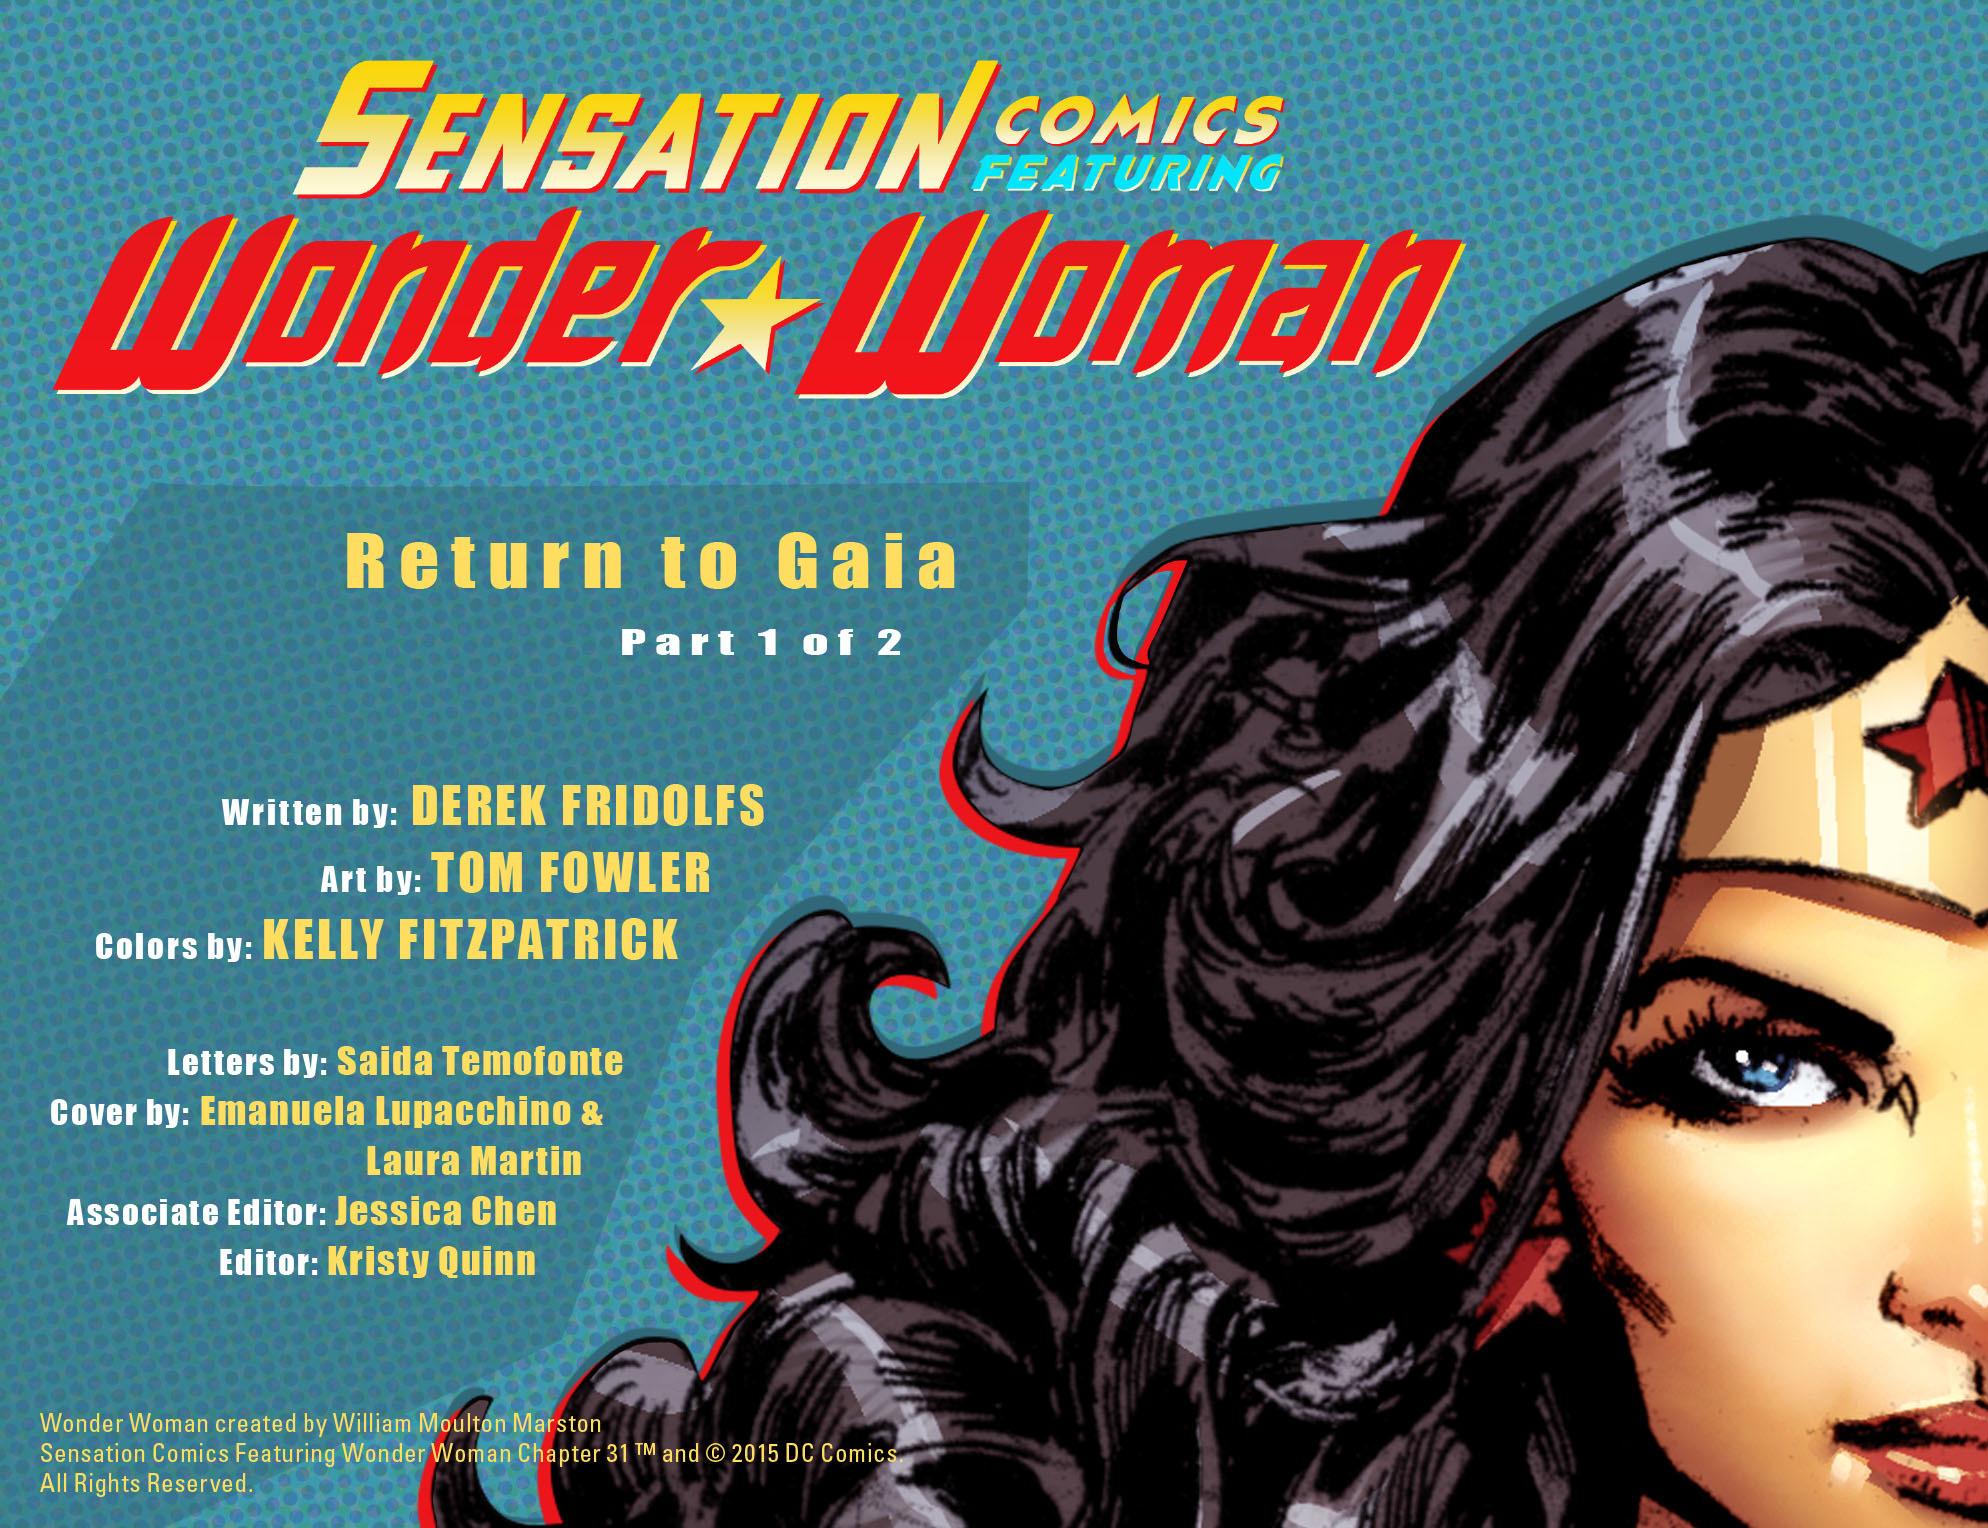 Read online Sensation Comics Featuring Wonder Woman comic -  Issue #31 - 2